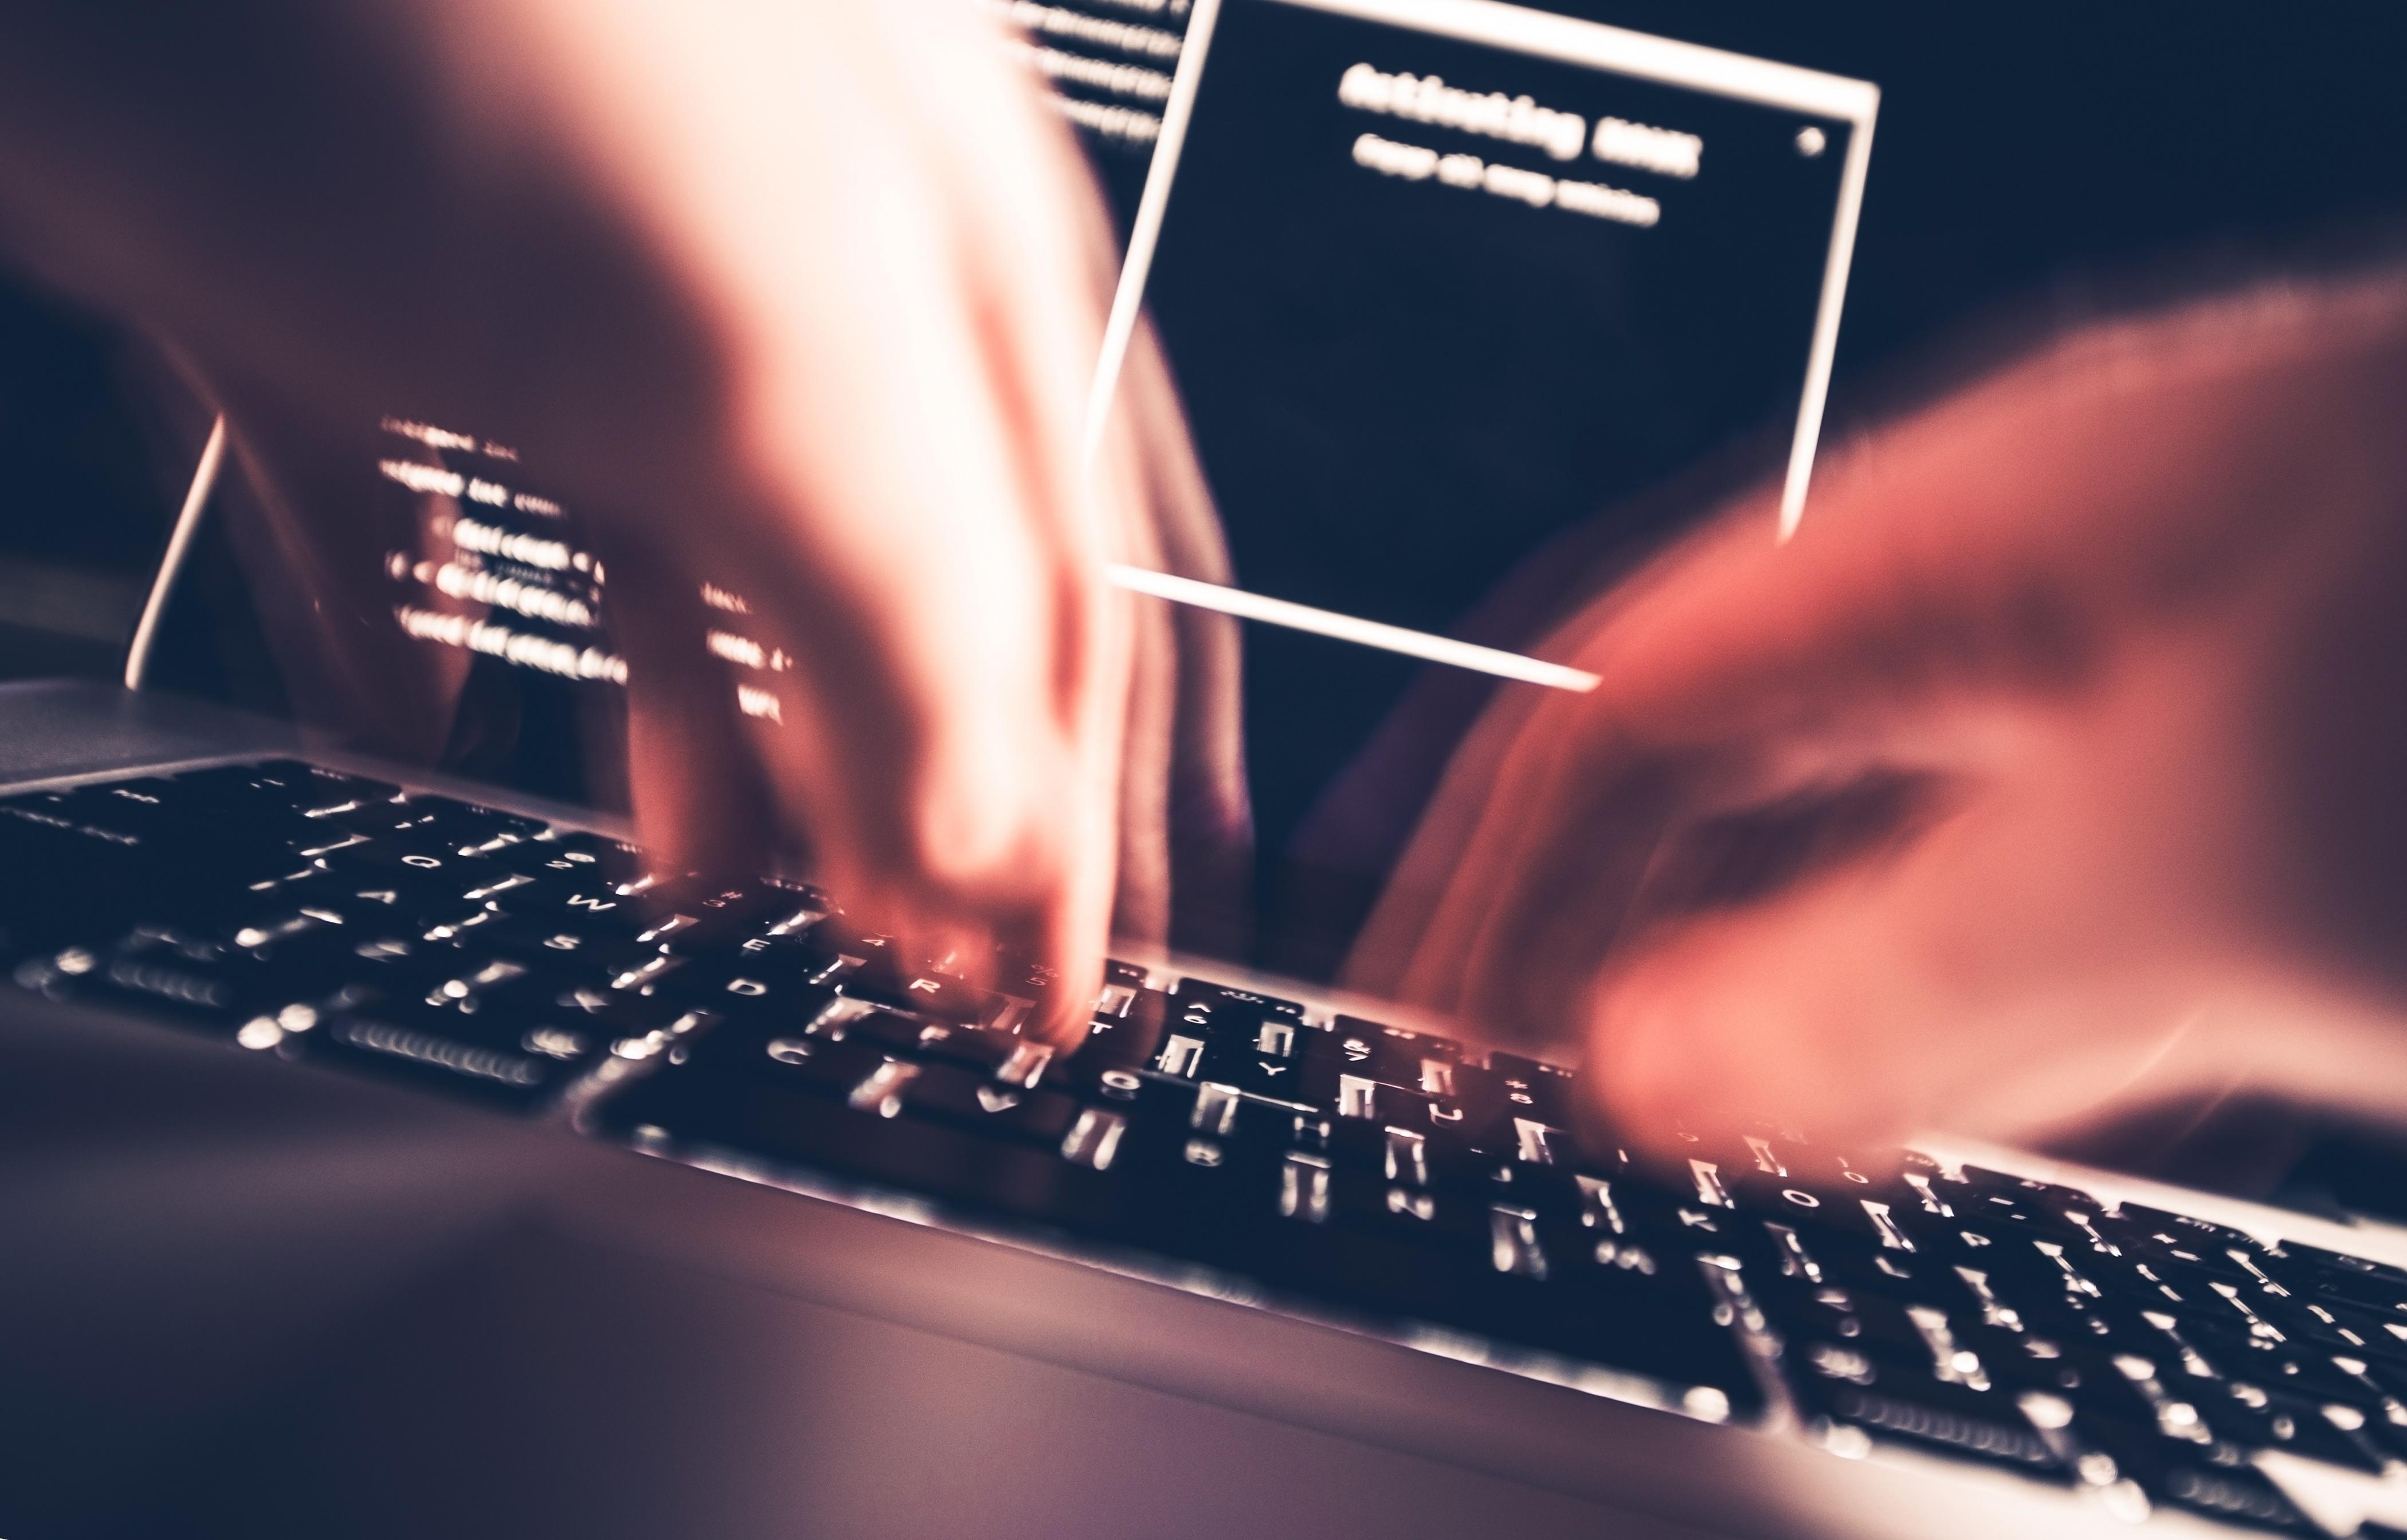 Senate Passes Cybersecurity Bill, More Effort Needed